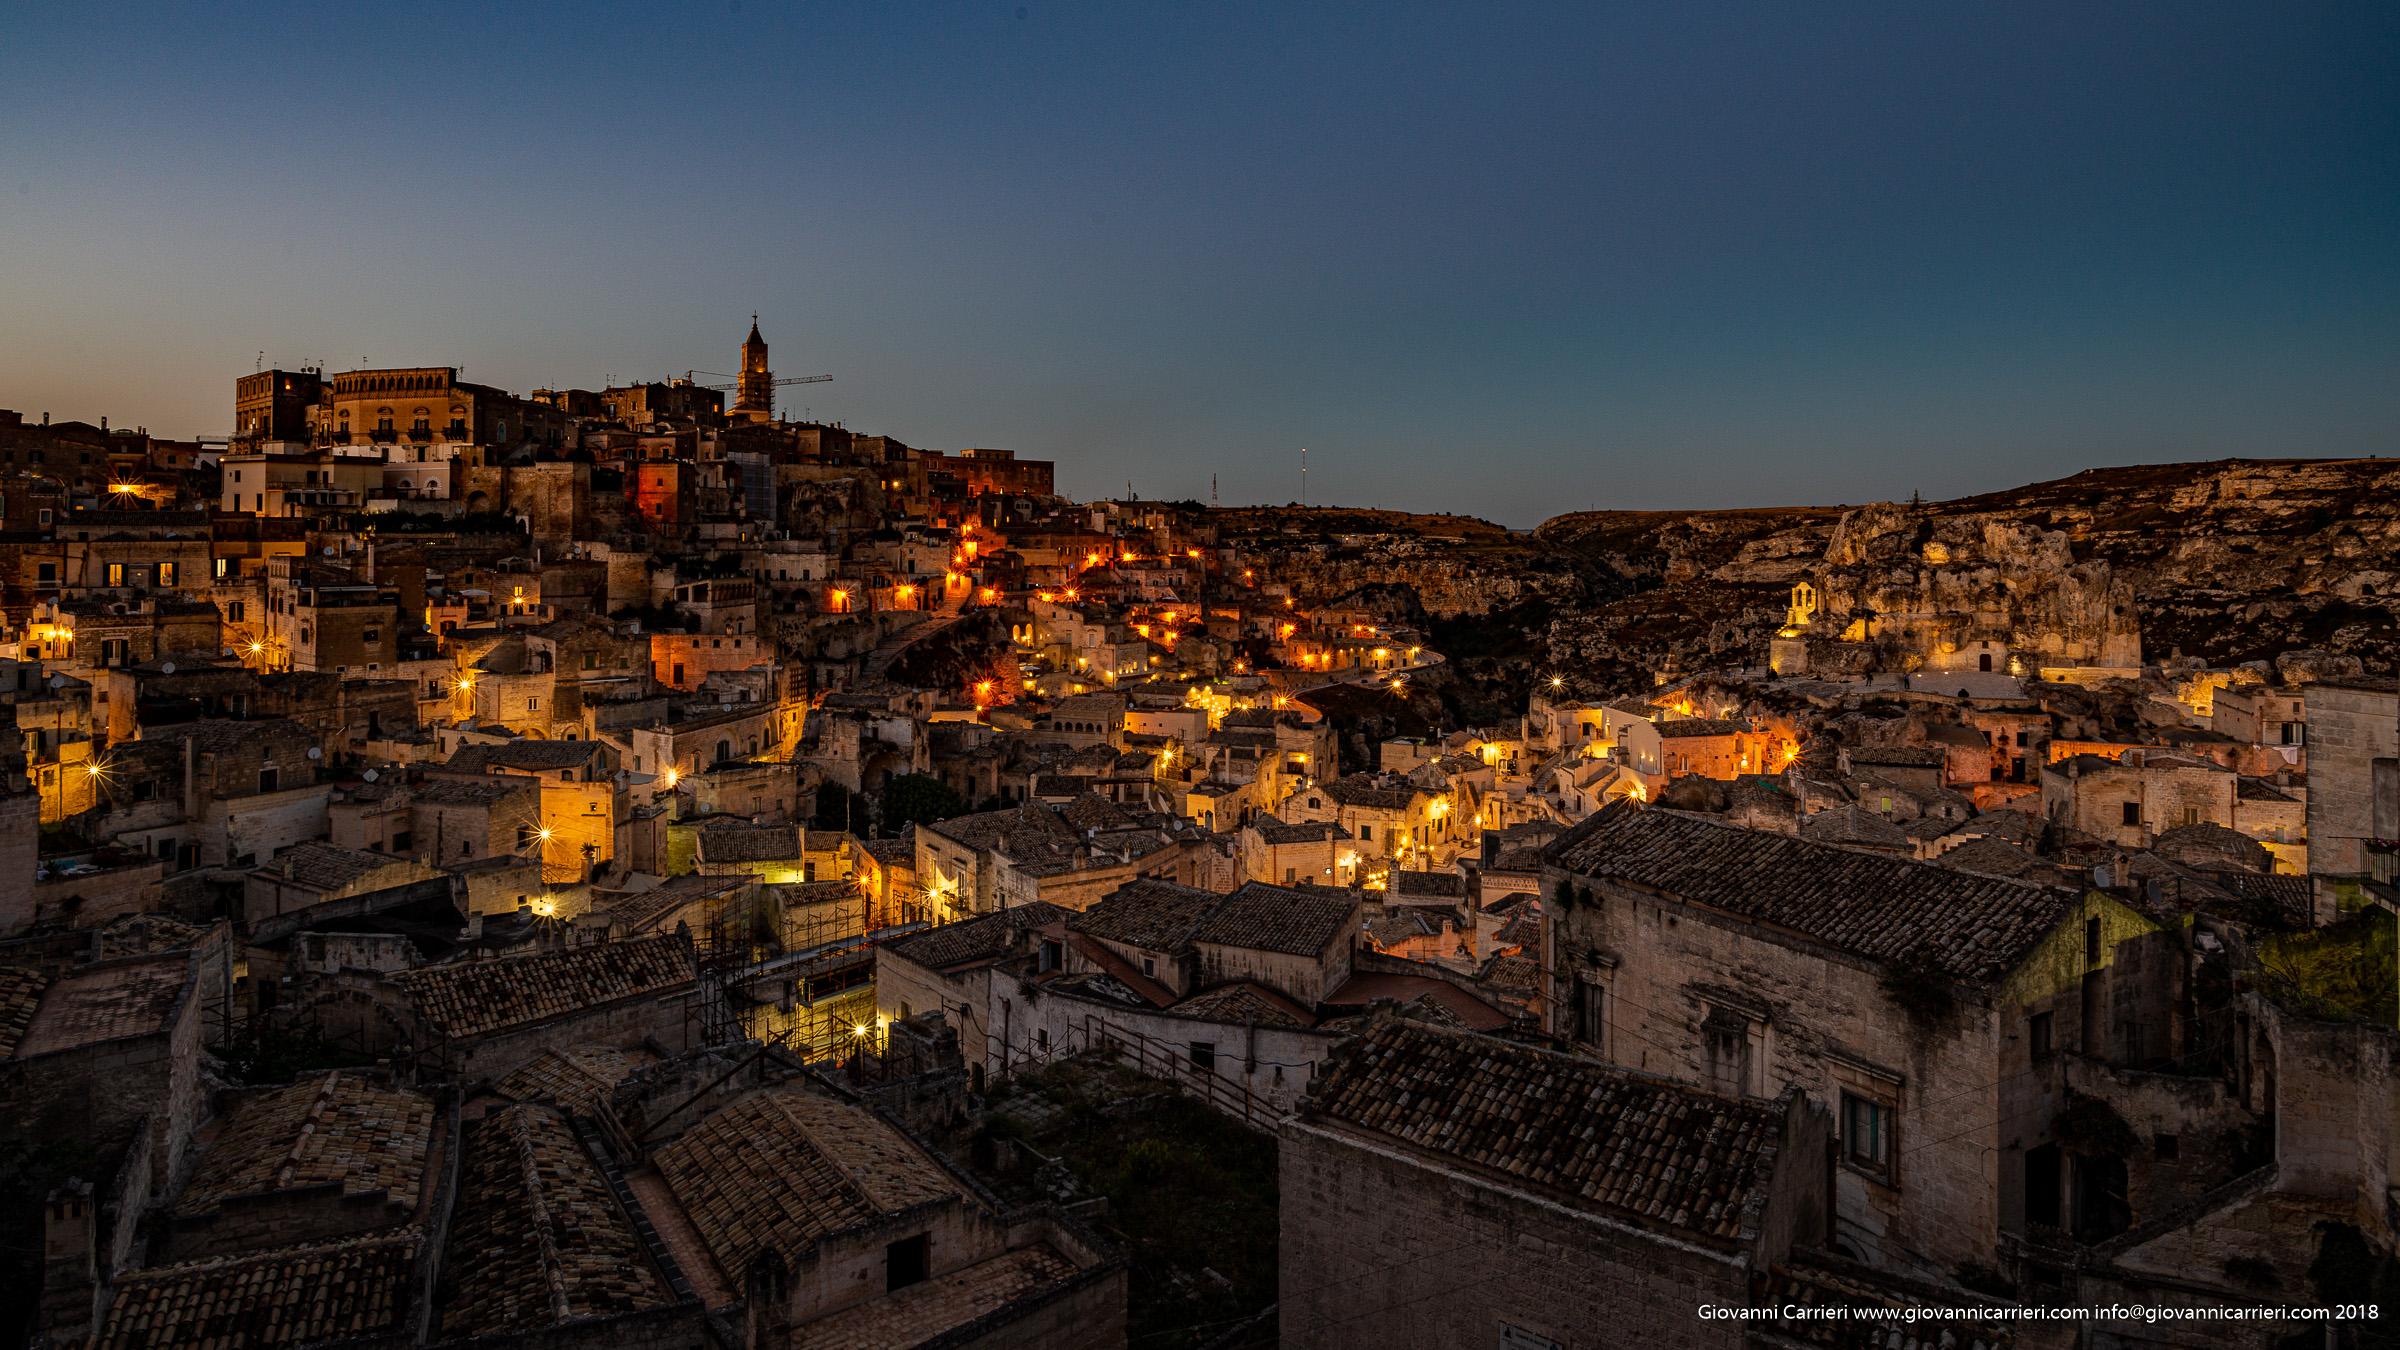 Panoramica notturna su Matera